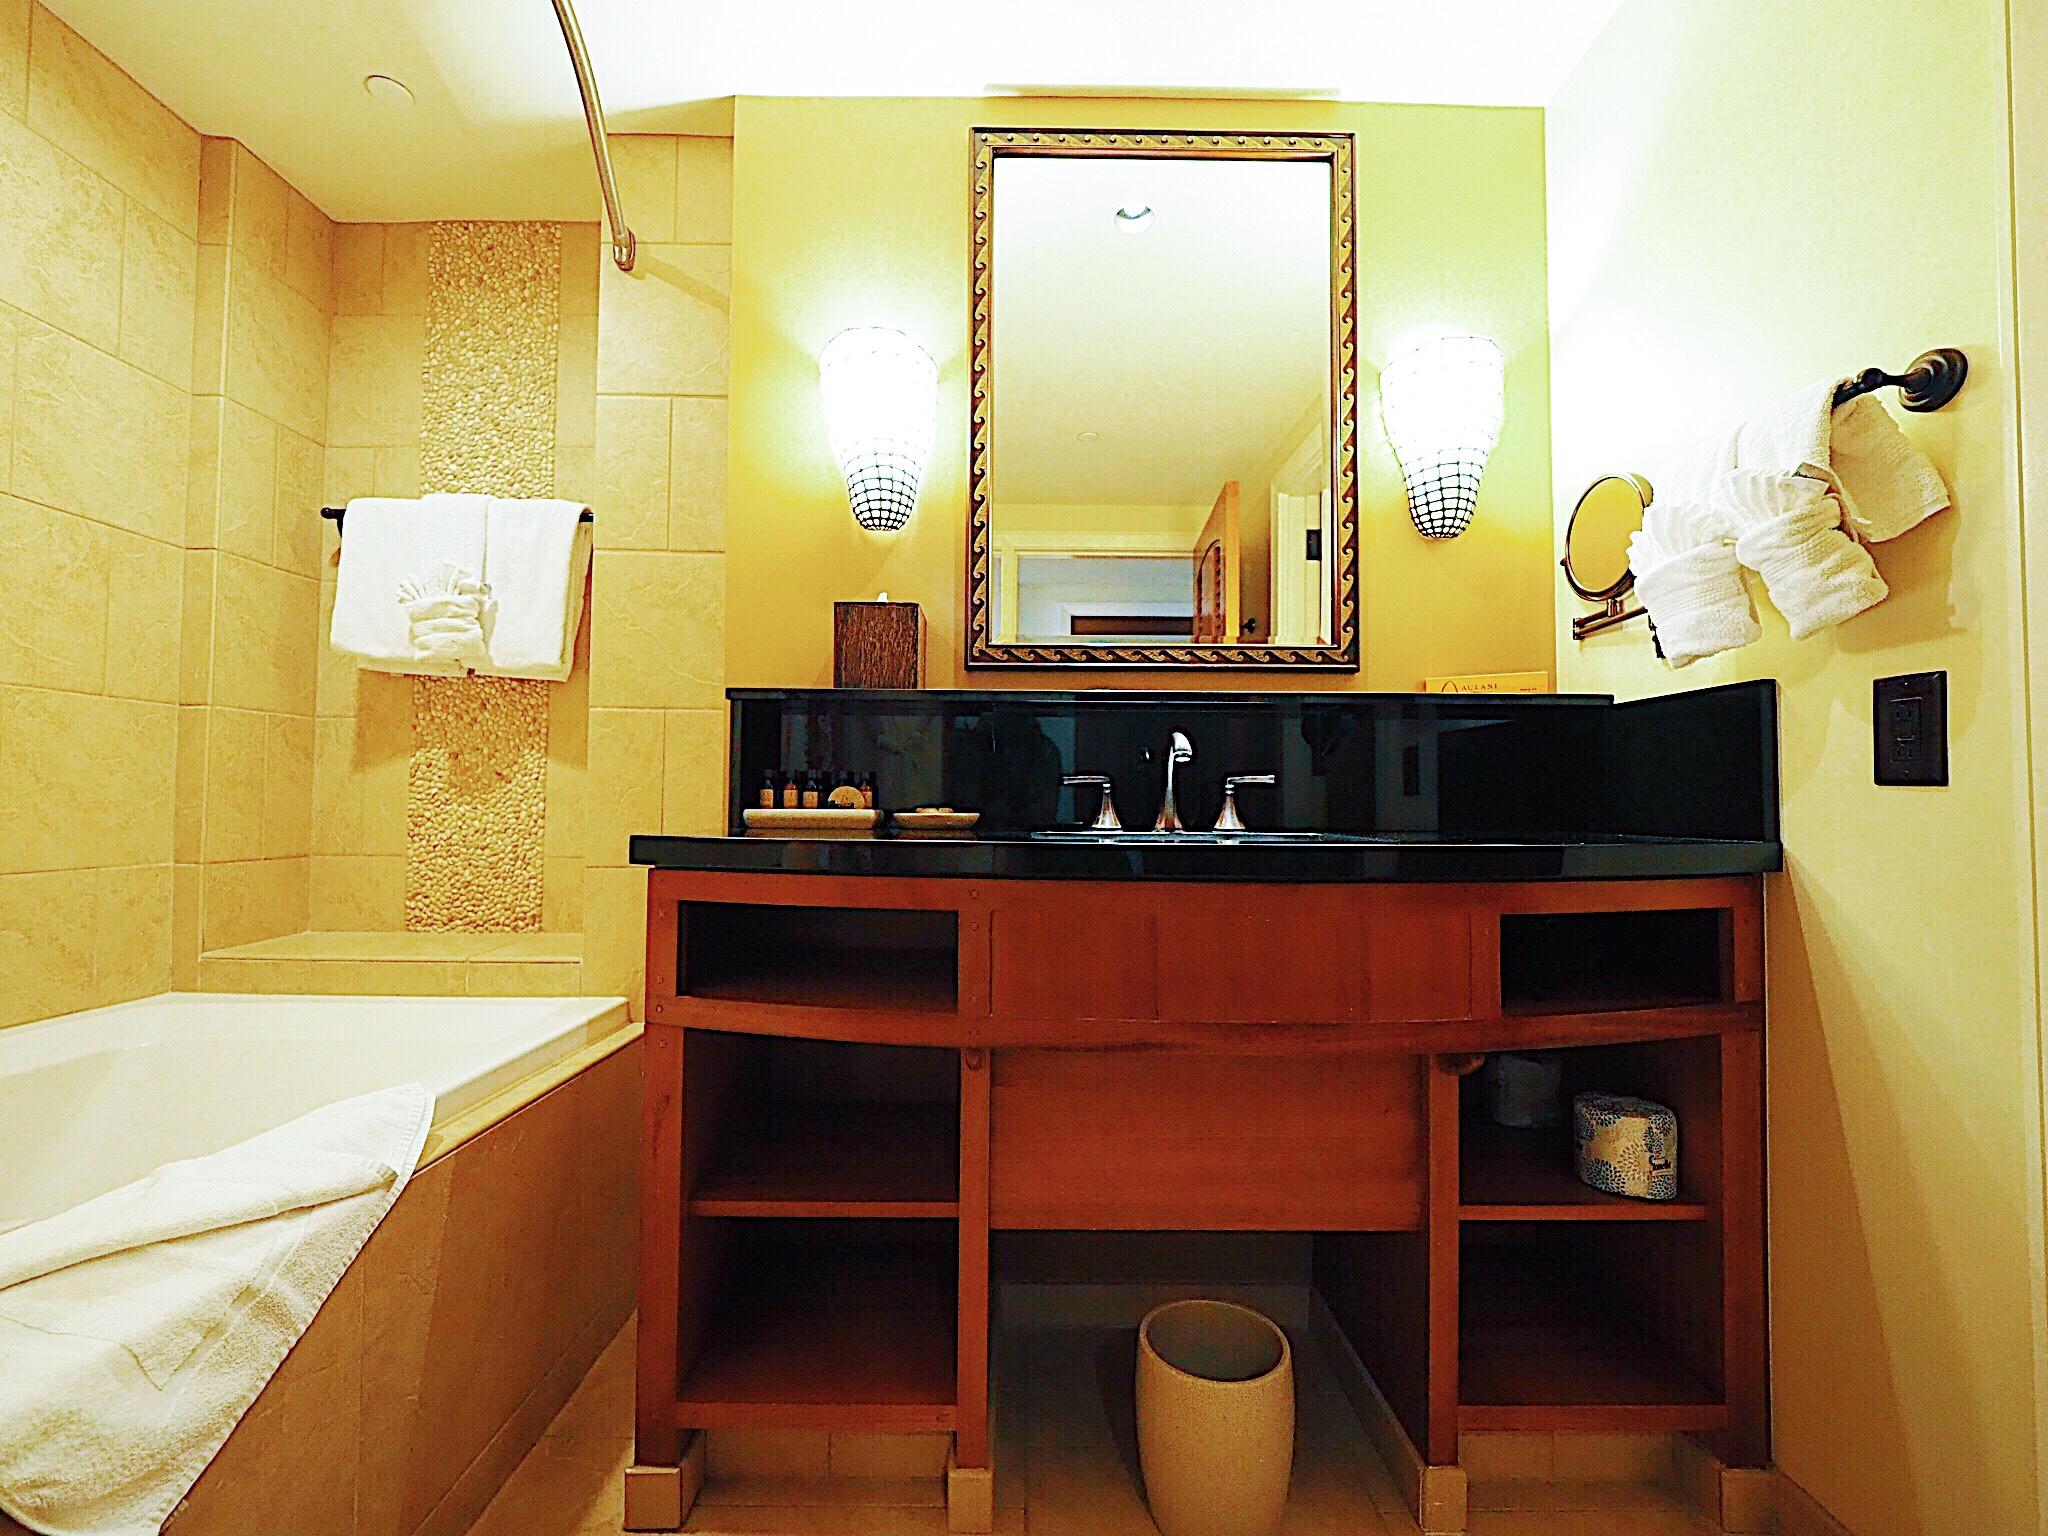 83bcd724 4ad3 4951 9321 b3955ec52c75 - Aulani, A Disney Resort & Spa  - 家族で、女子旅で泊まりたい!ディズニーマジックのかかったハワイのリゾート